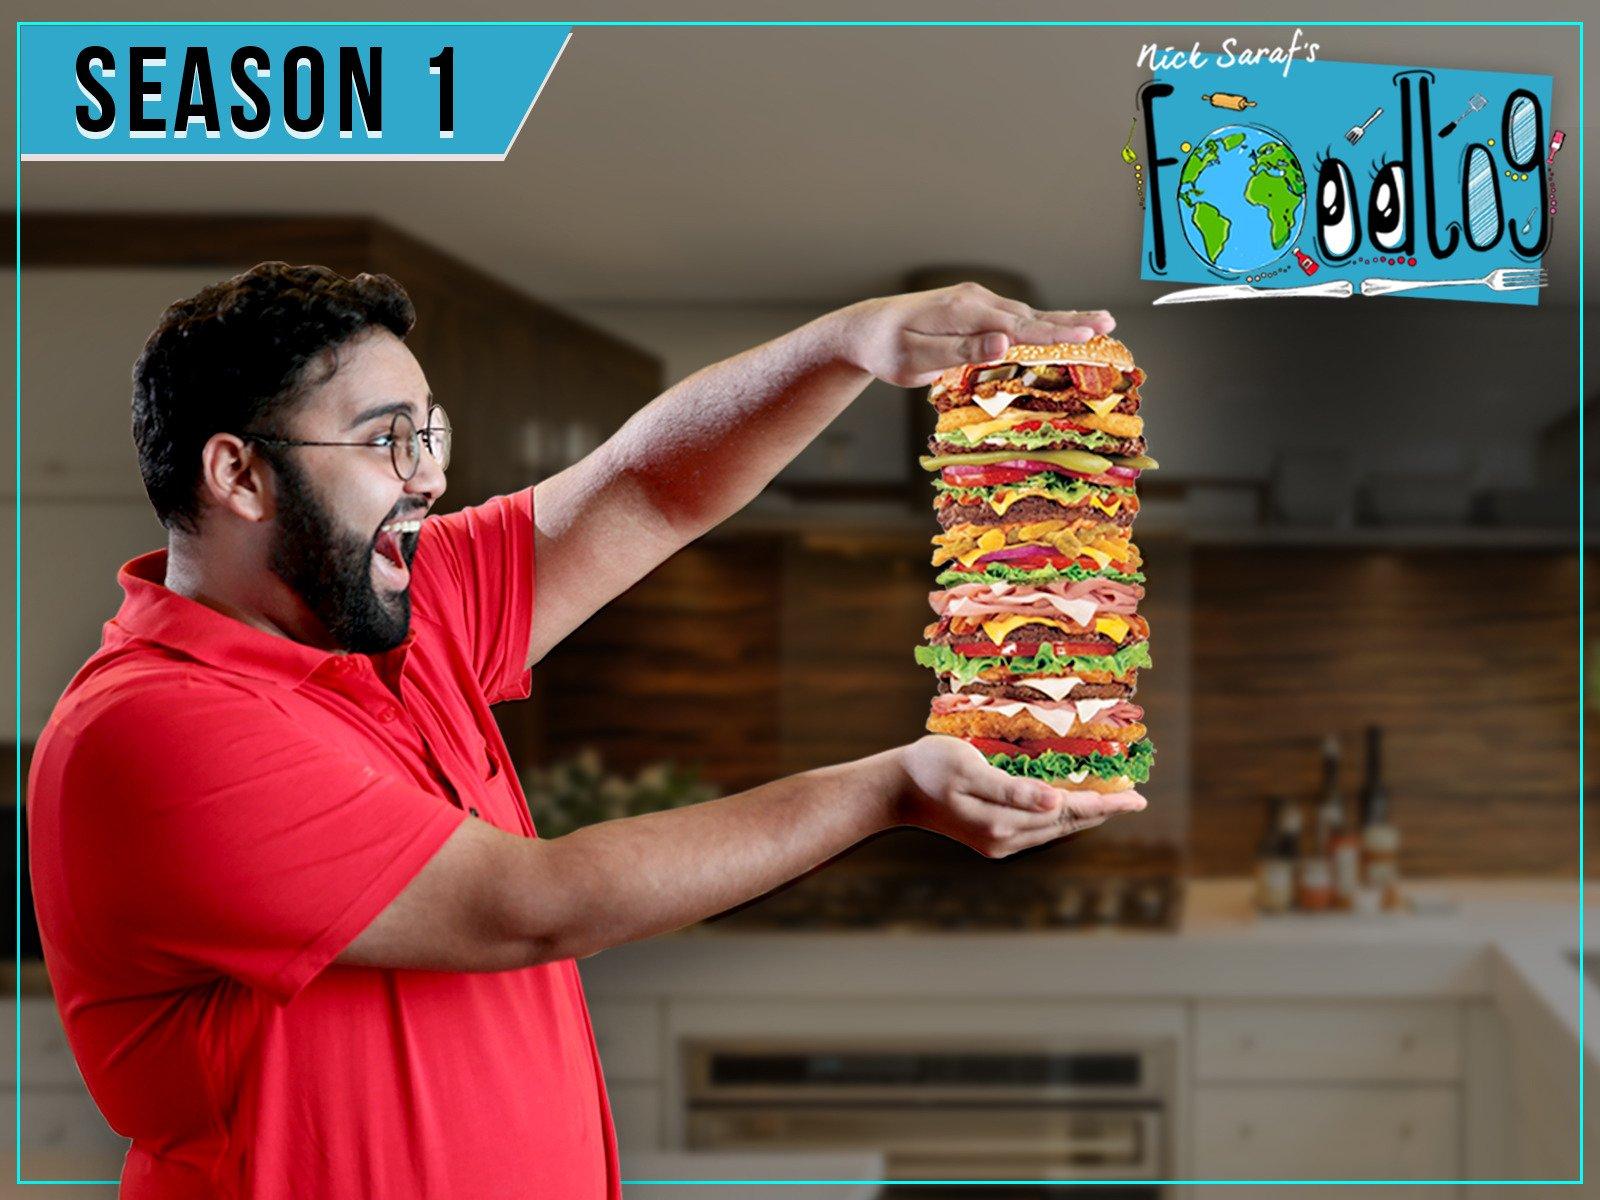 Clip: Nick Saraf's Foodlog - Season 1